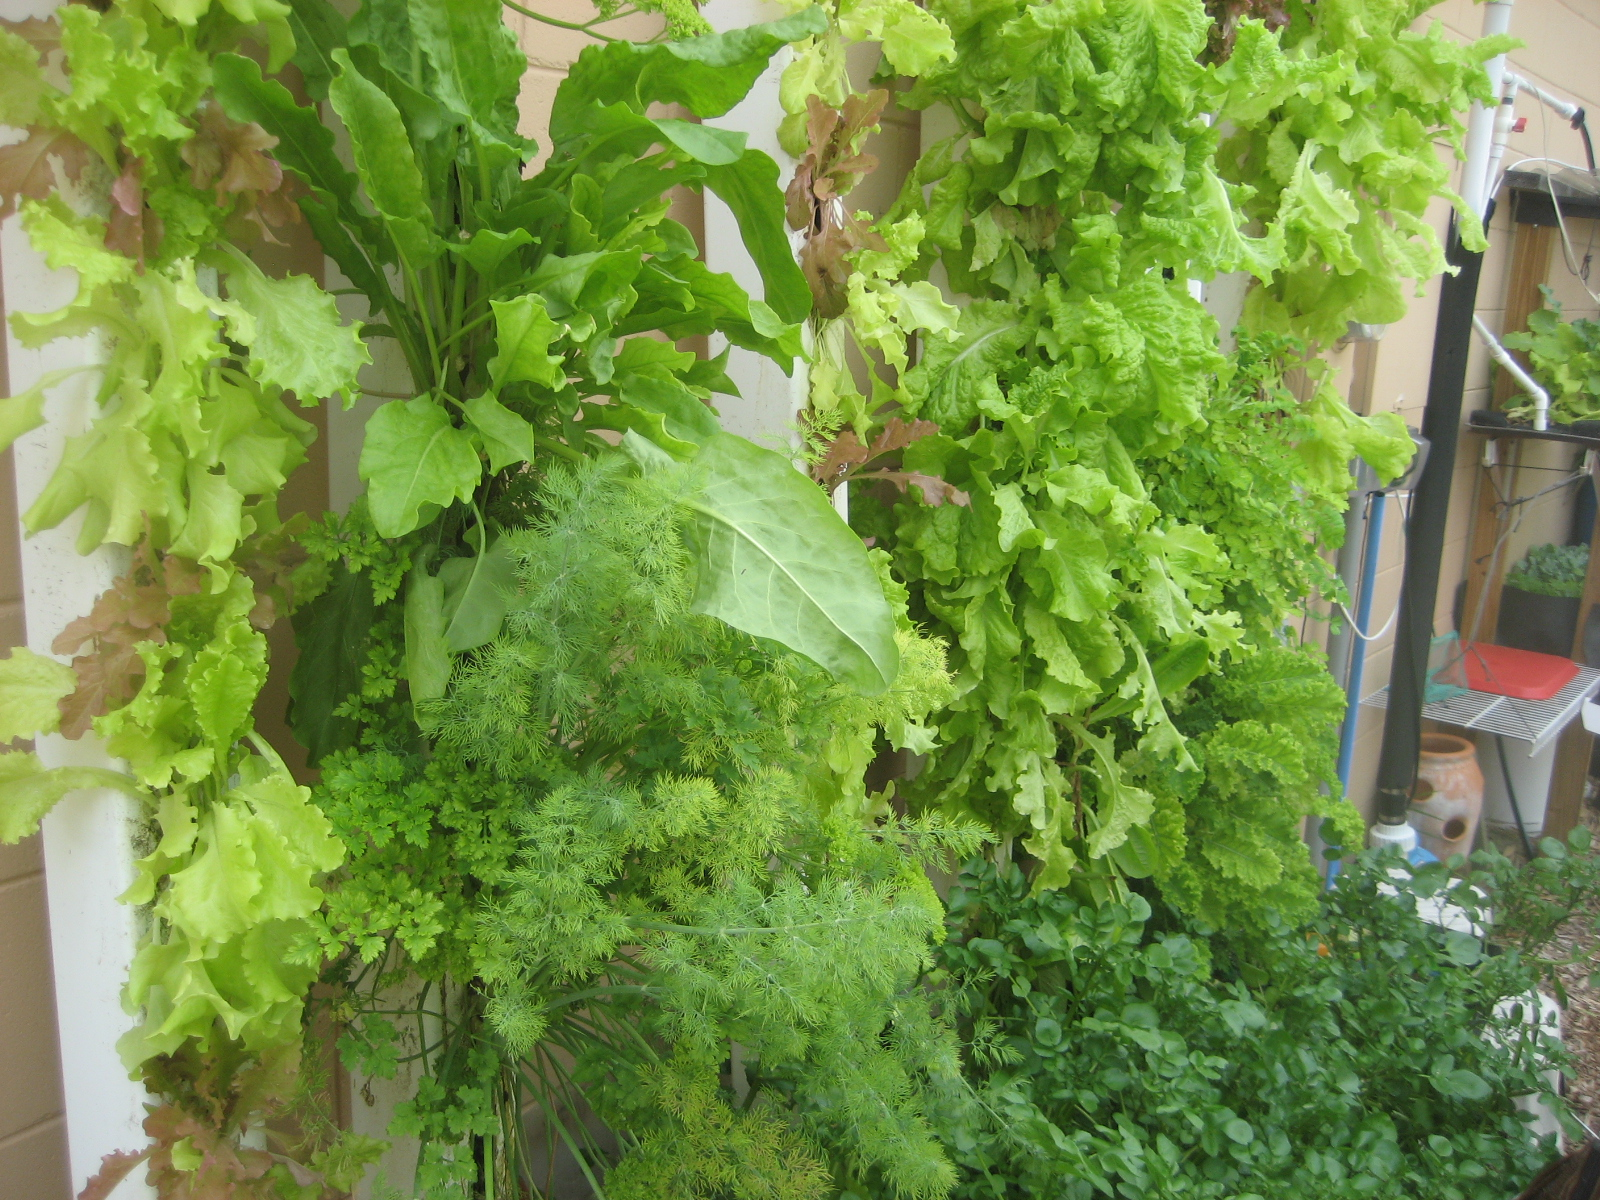 growing plants without soil ccres aquaponic ccres. Black Bedroom Furniture Sets. Home Design Ideas